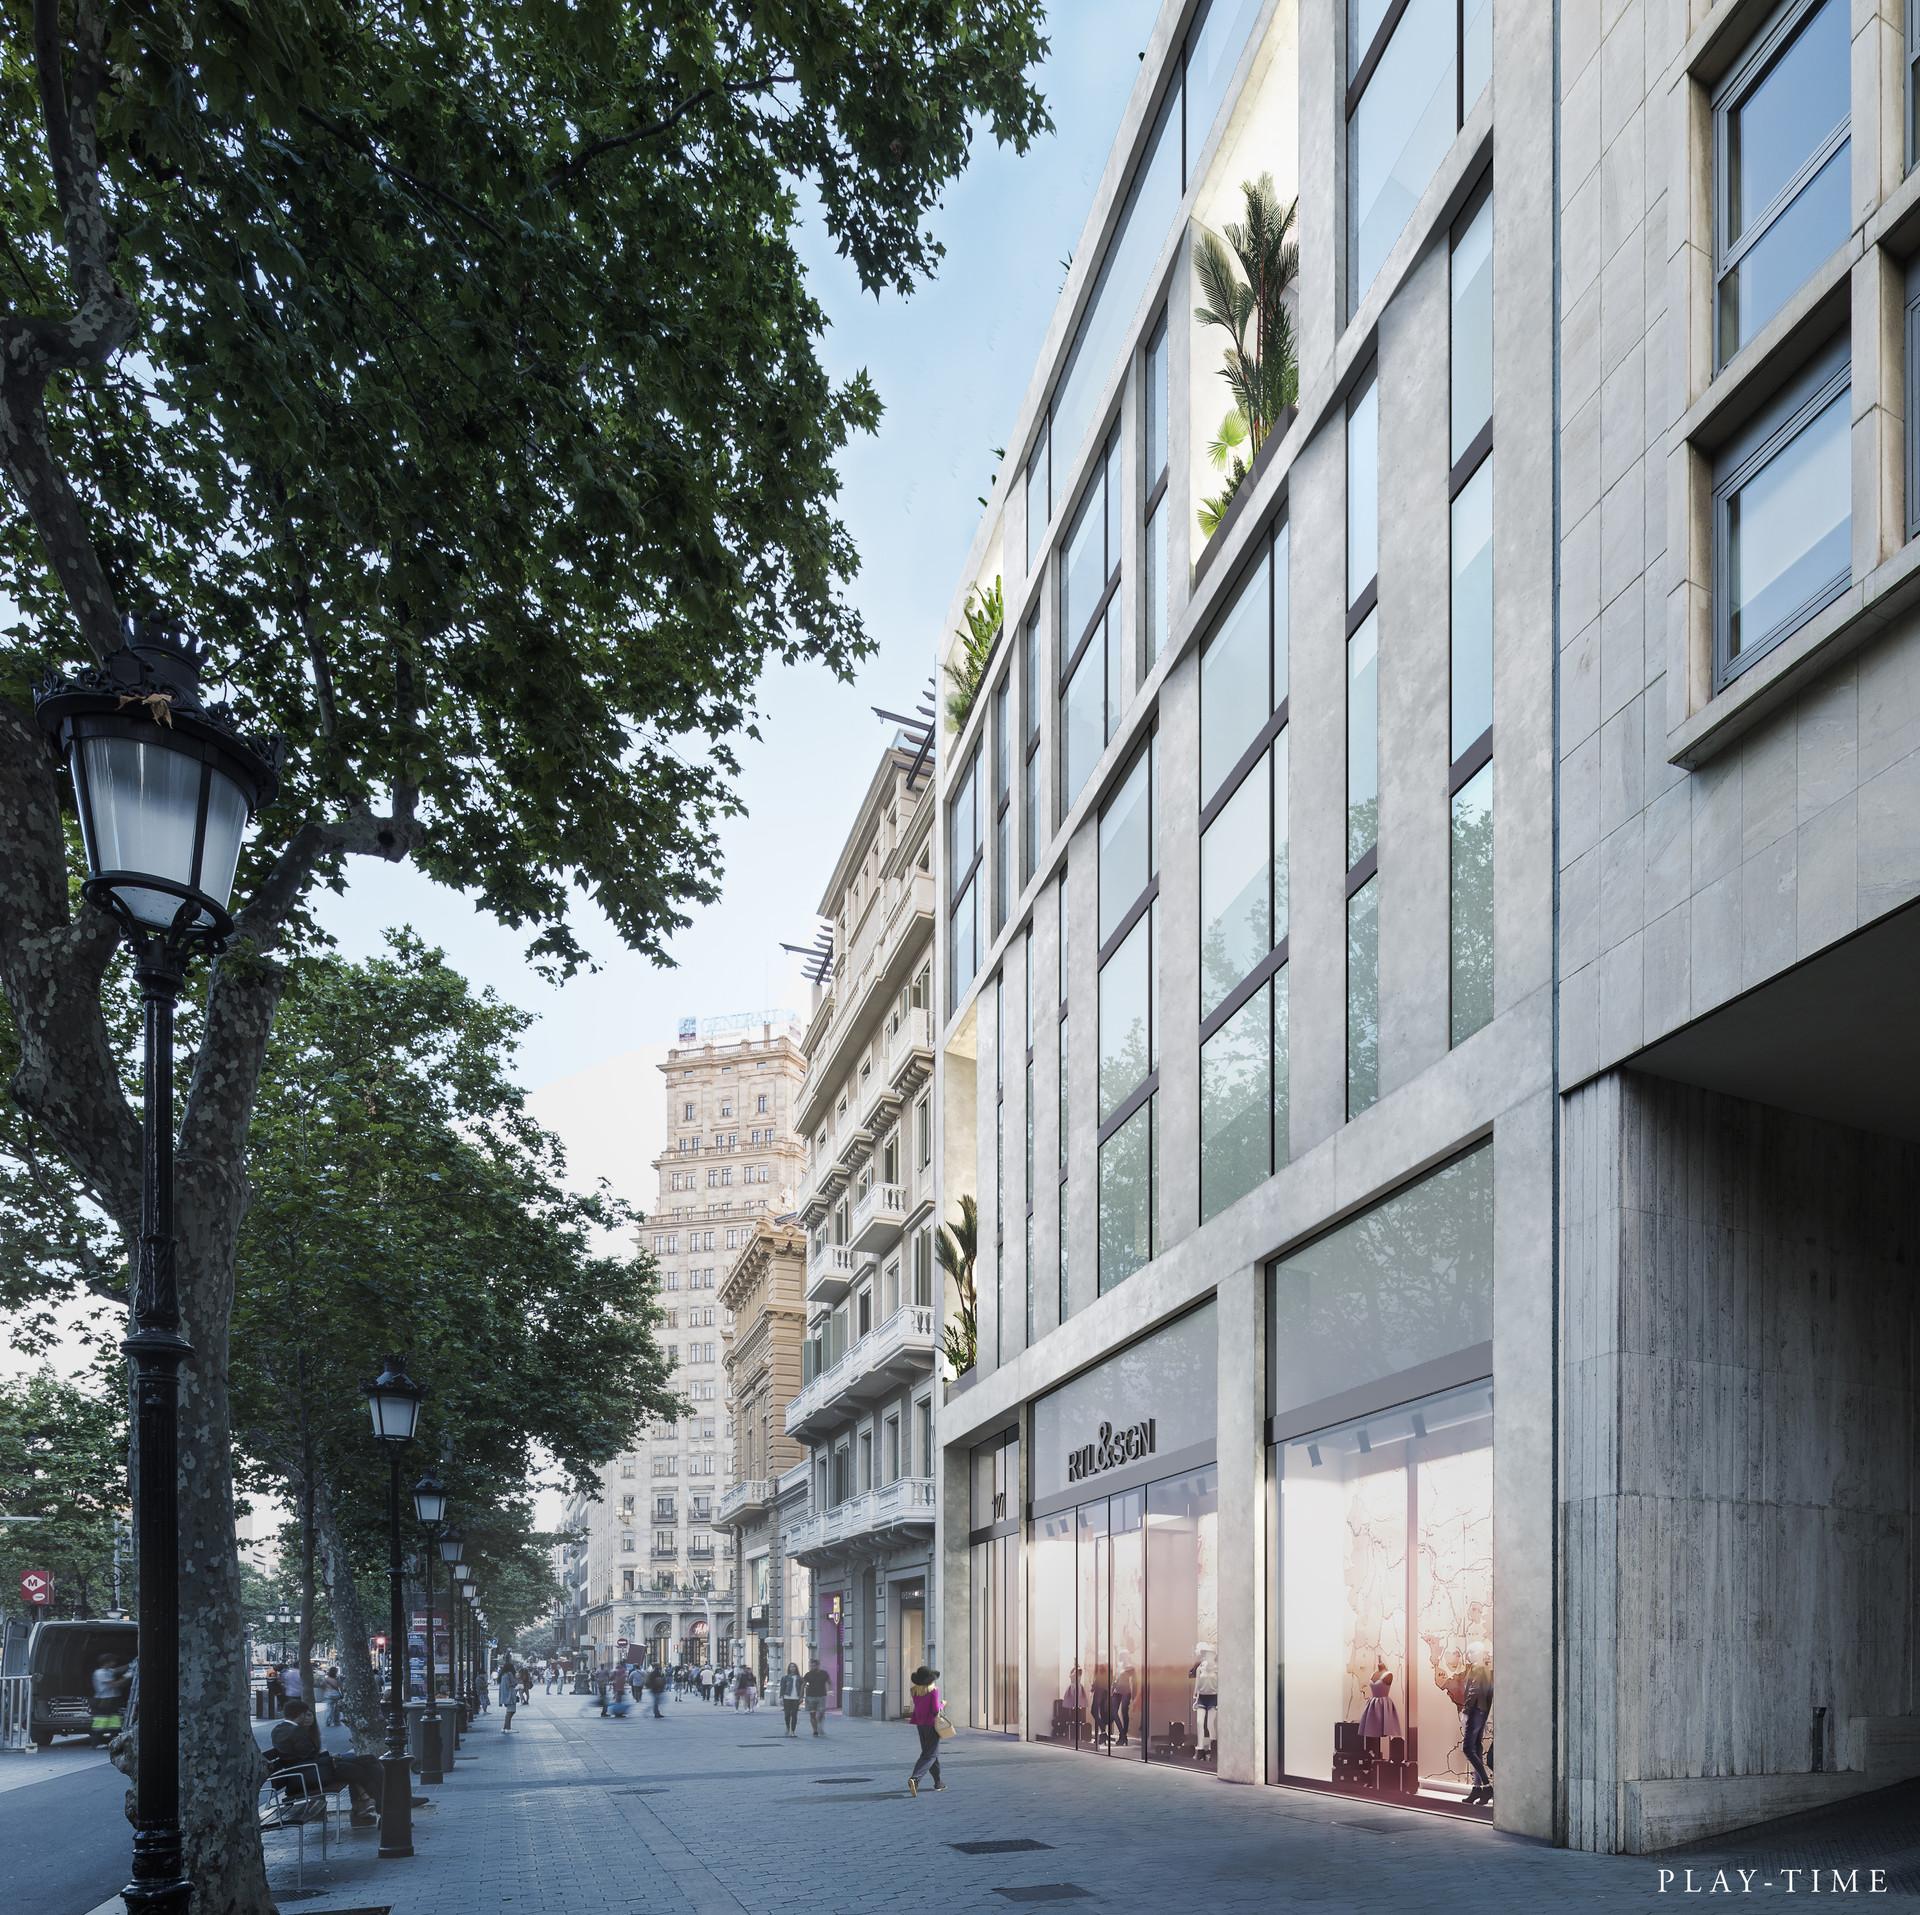 Play time architectonic image group g4 oficines a passeig de gracia barcelona 02